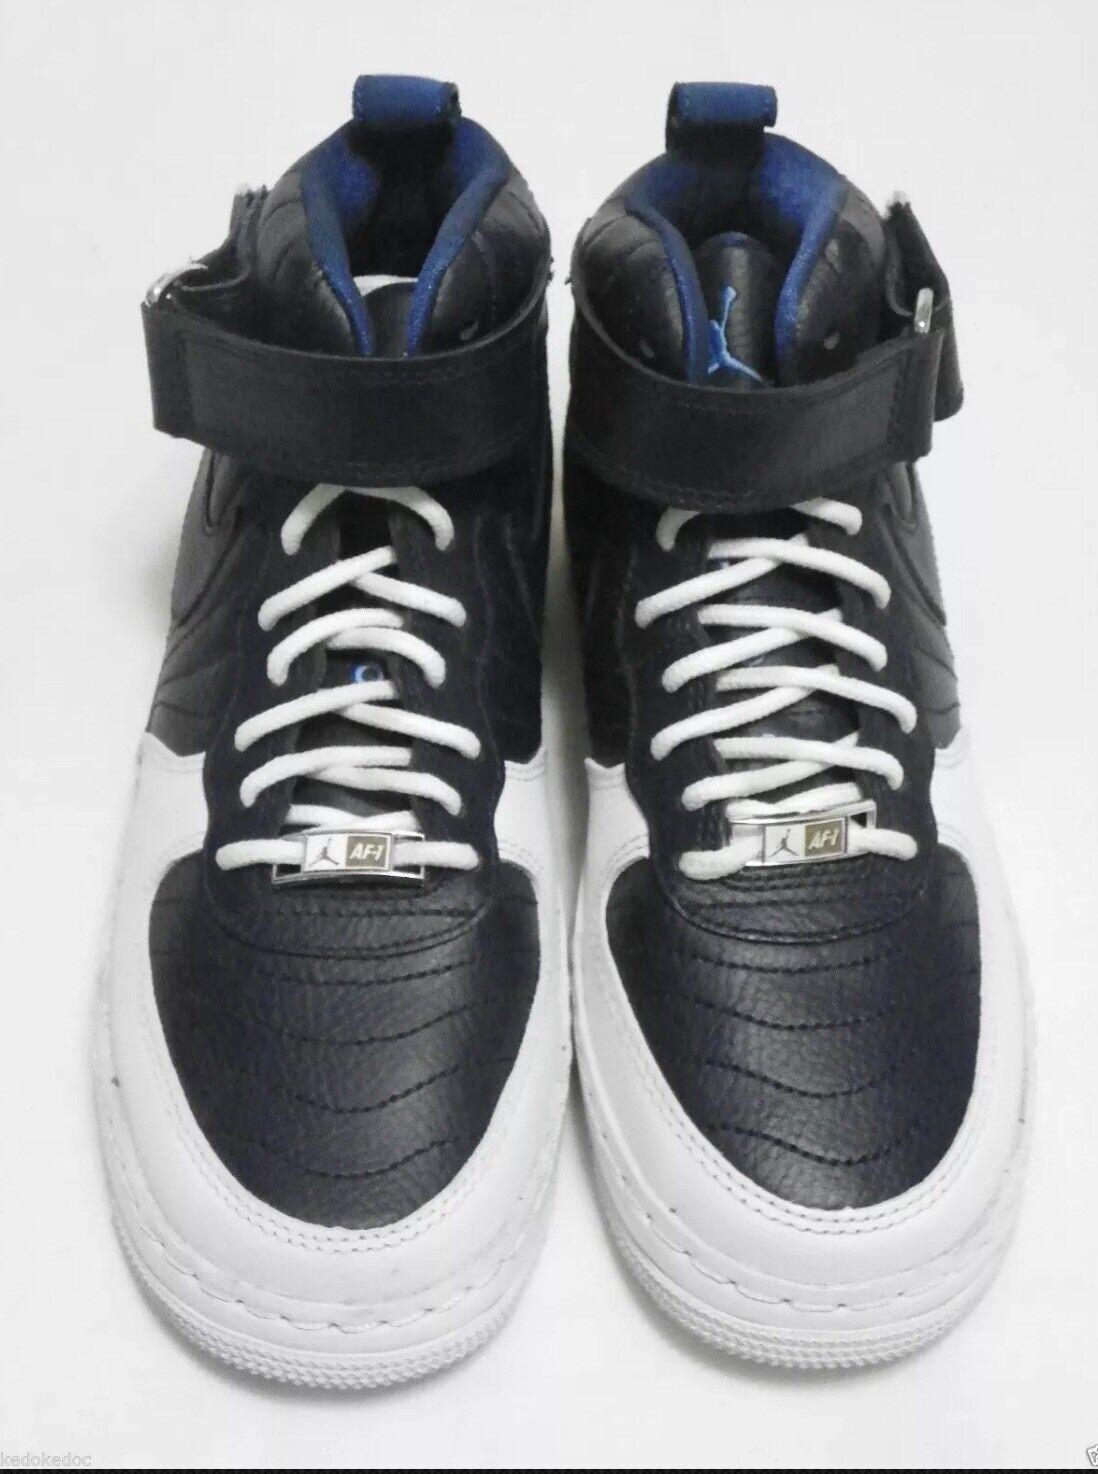 Air Jordan AJF 12 Mid Basketball Shoes US 5.5Y  cm Navy [317743-401]